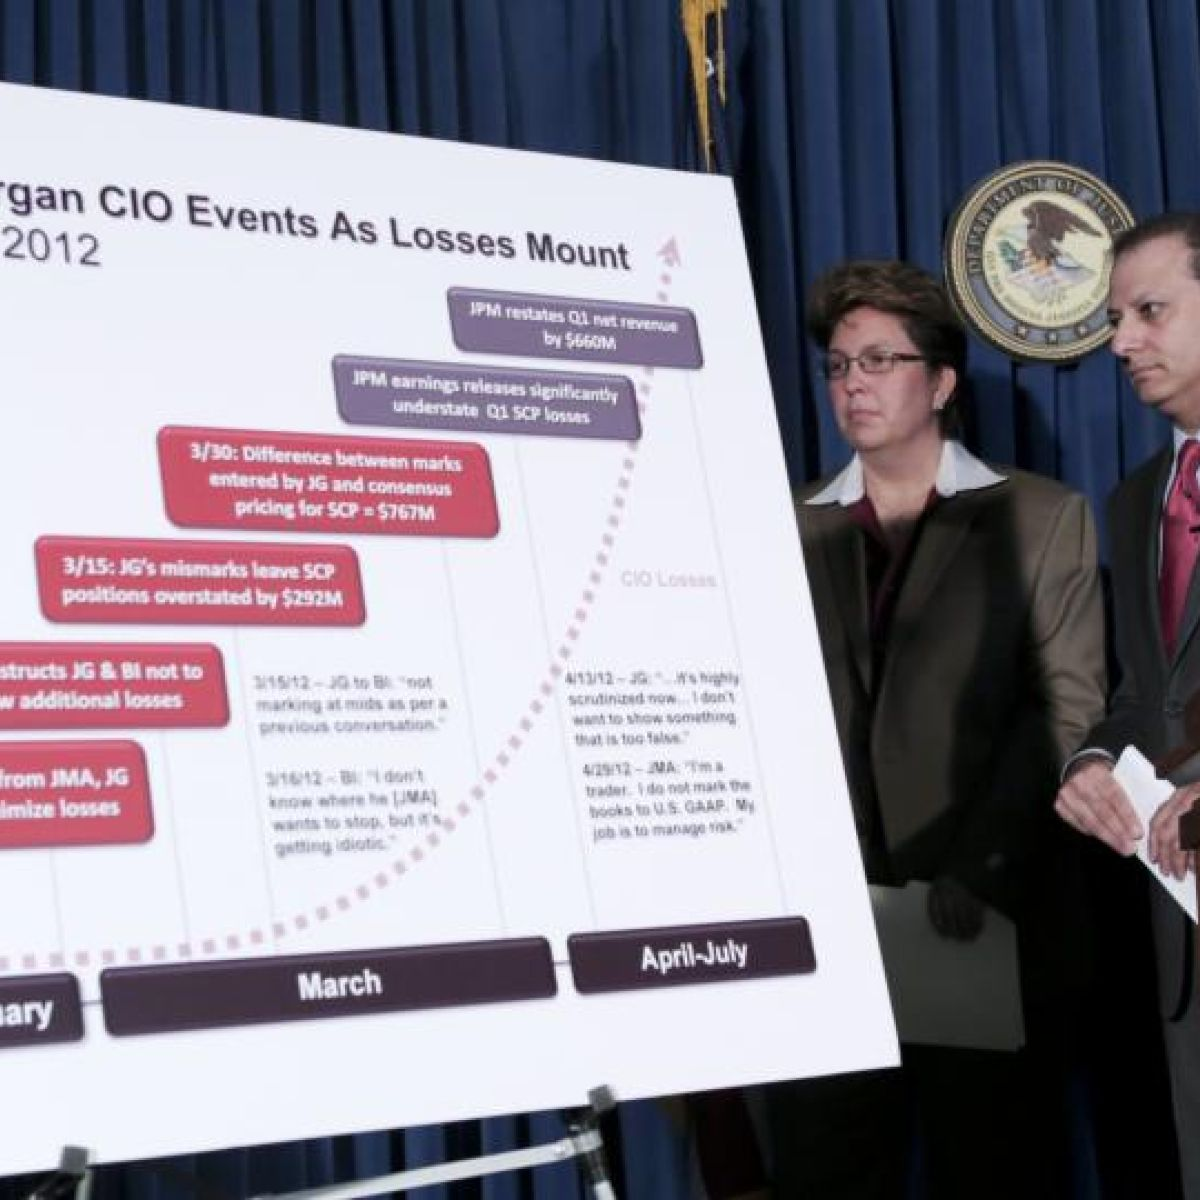 Cavalier risk-taking claims trigger JPMorgan inquiry